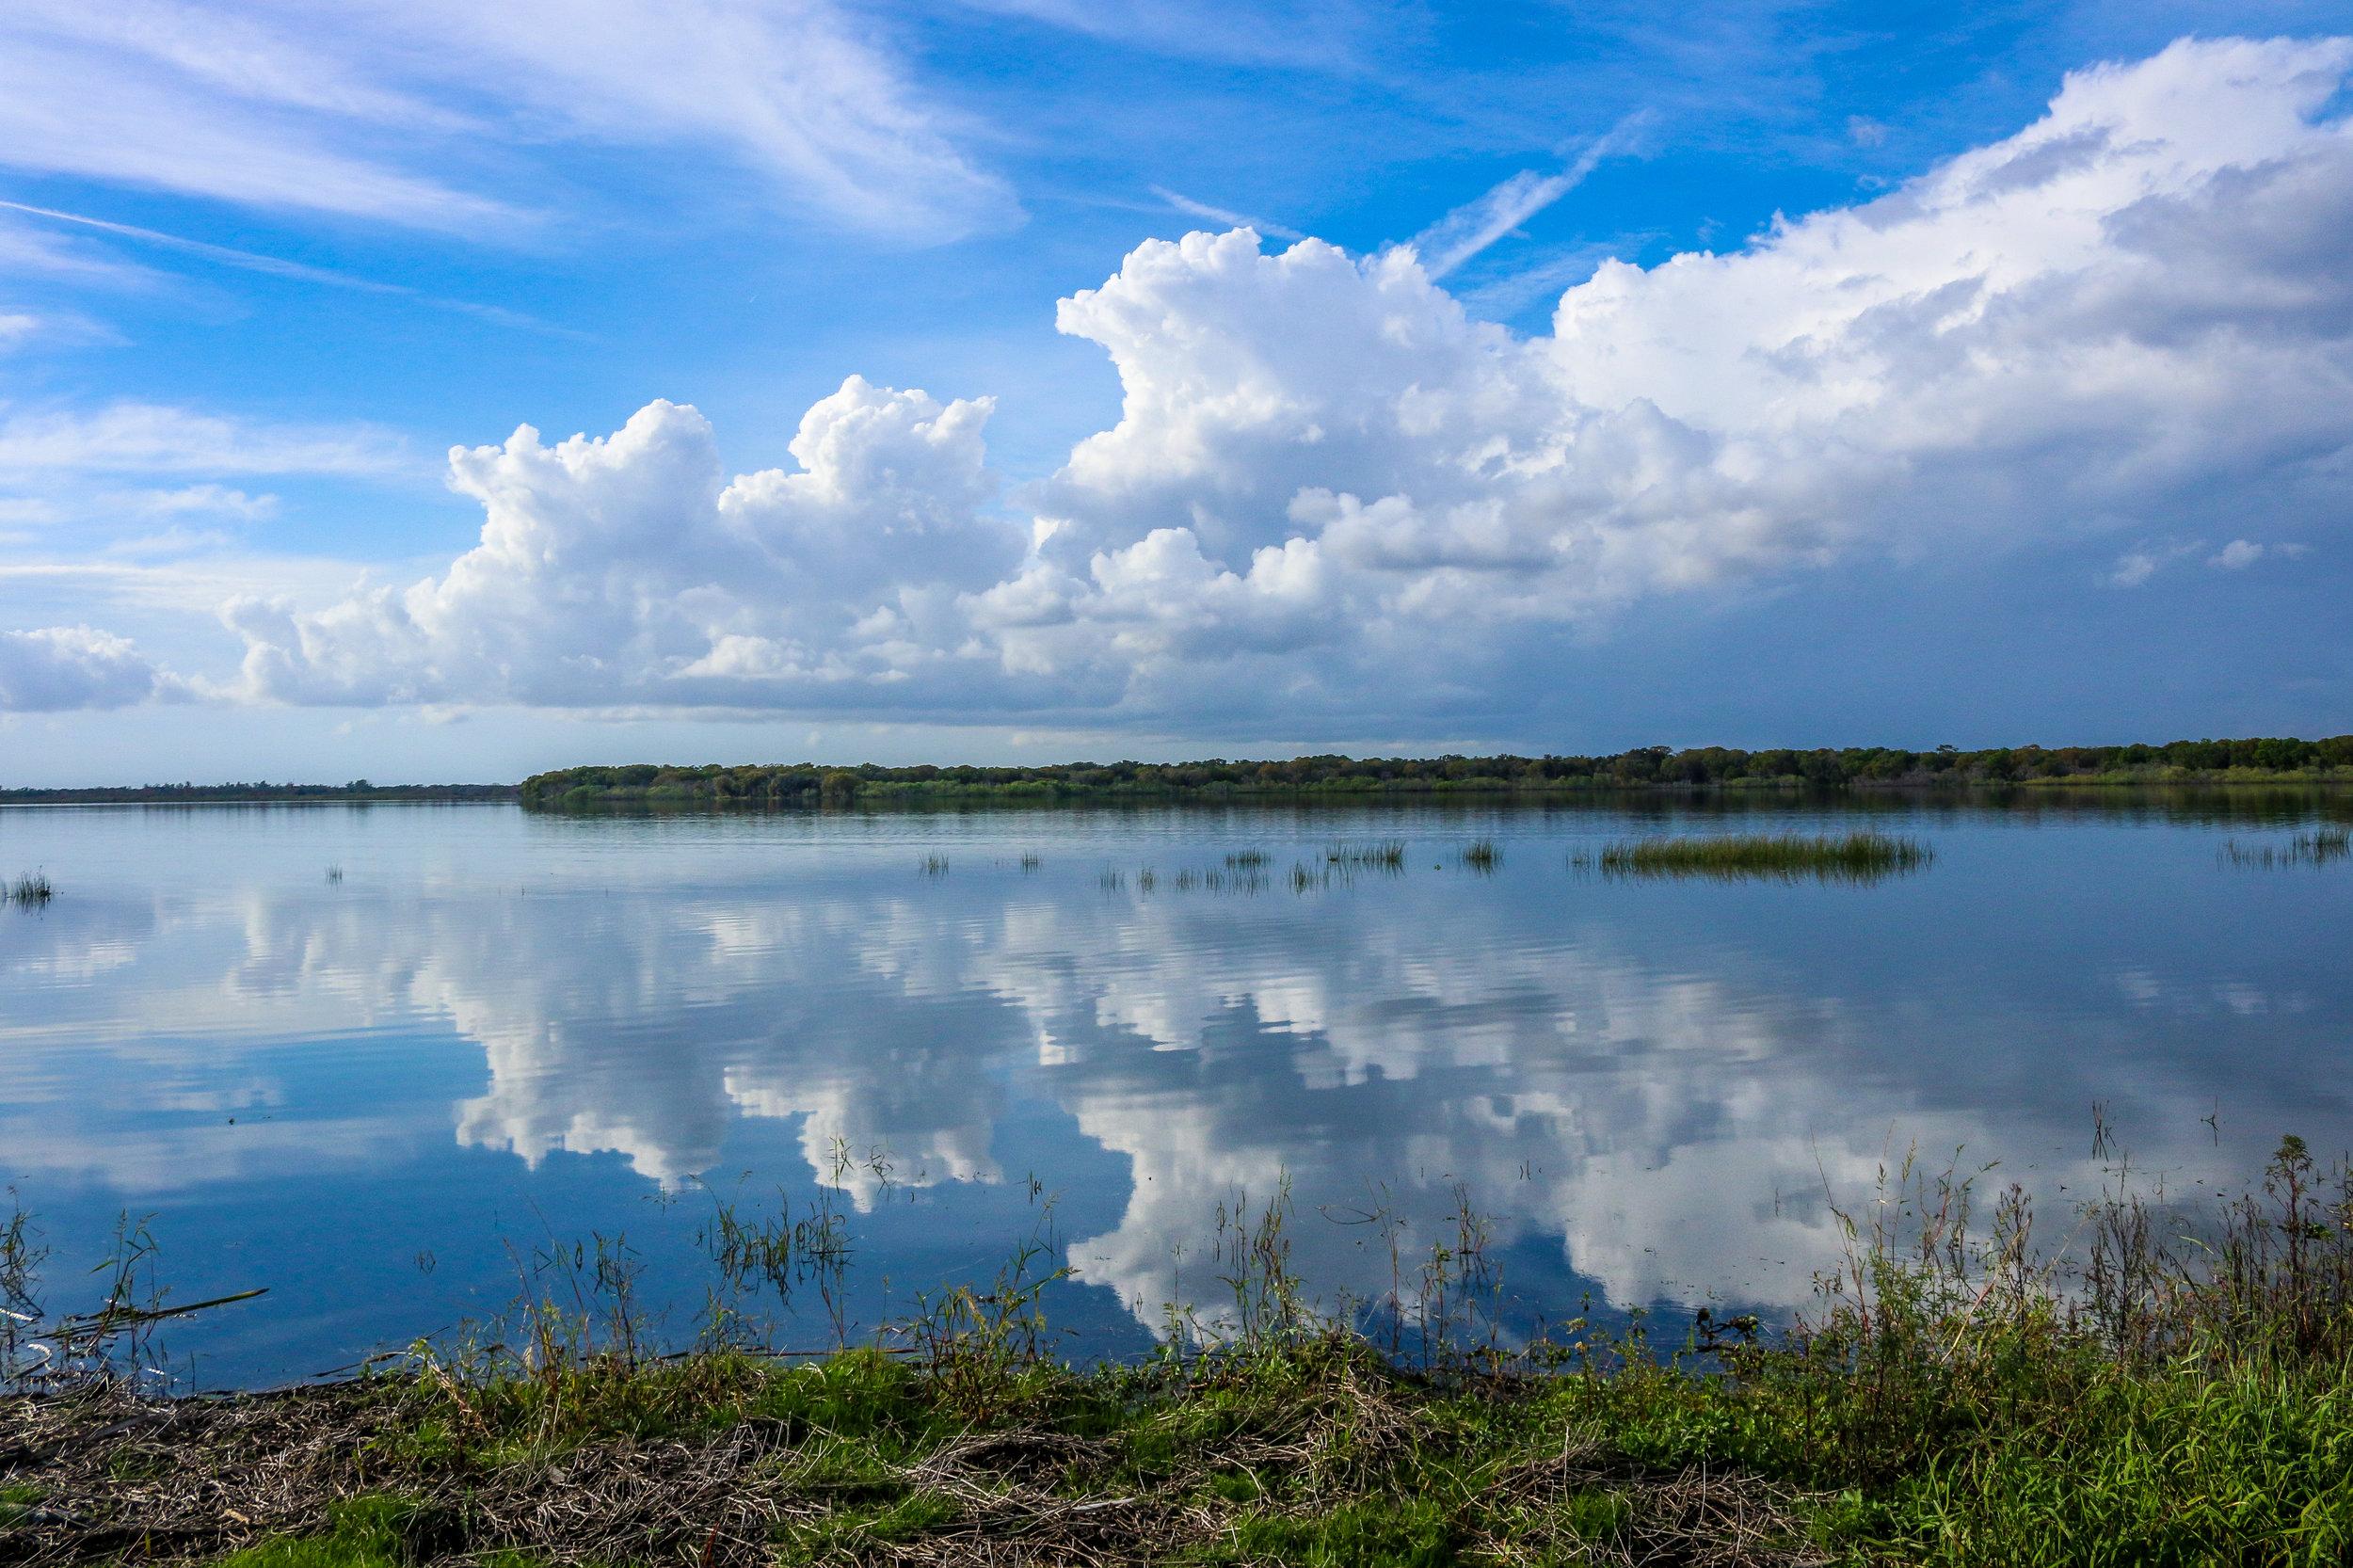 Reflections at Myakka River State Park